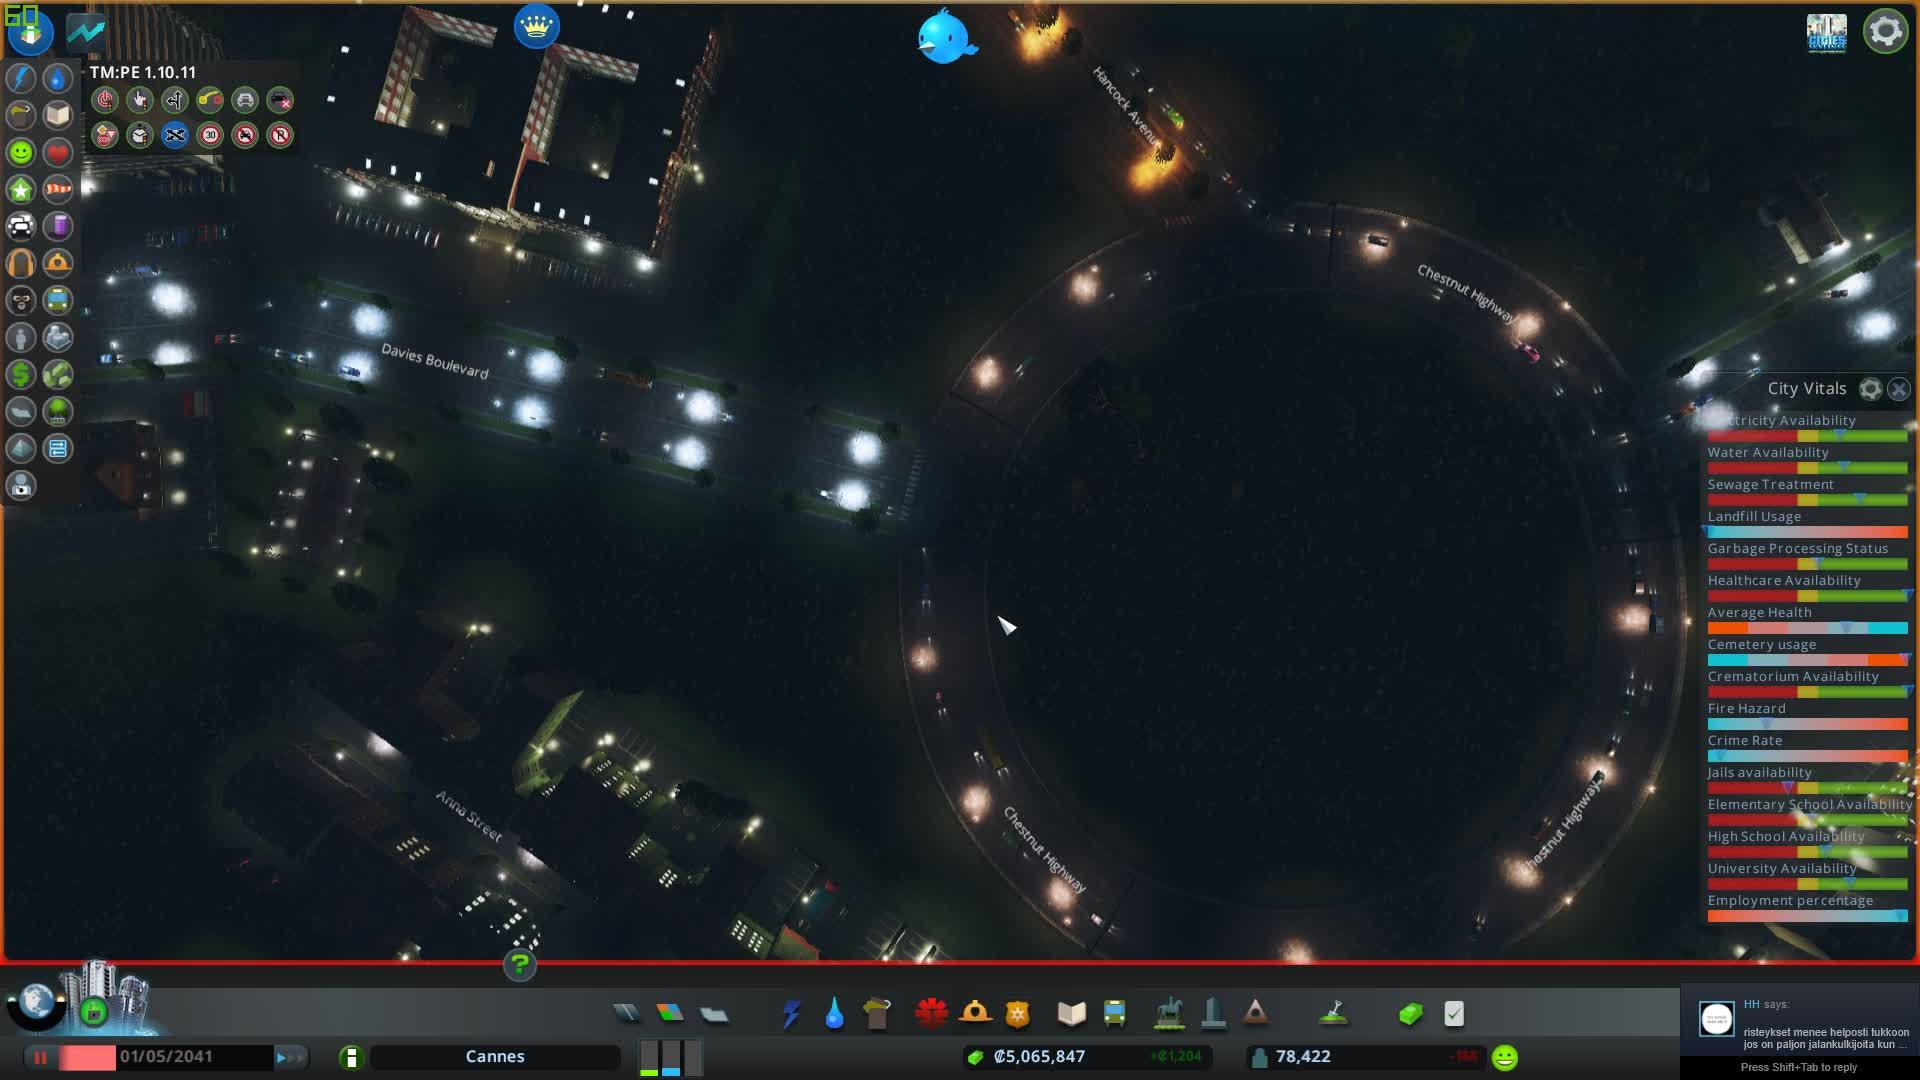 citiesskylines, Cities Skylines 2018.07.30 - 20.31.12.02.DVR GIFs